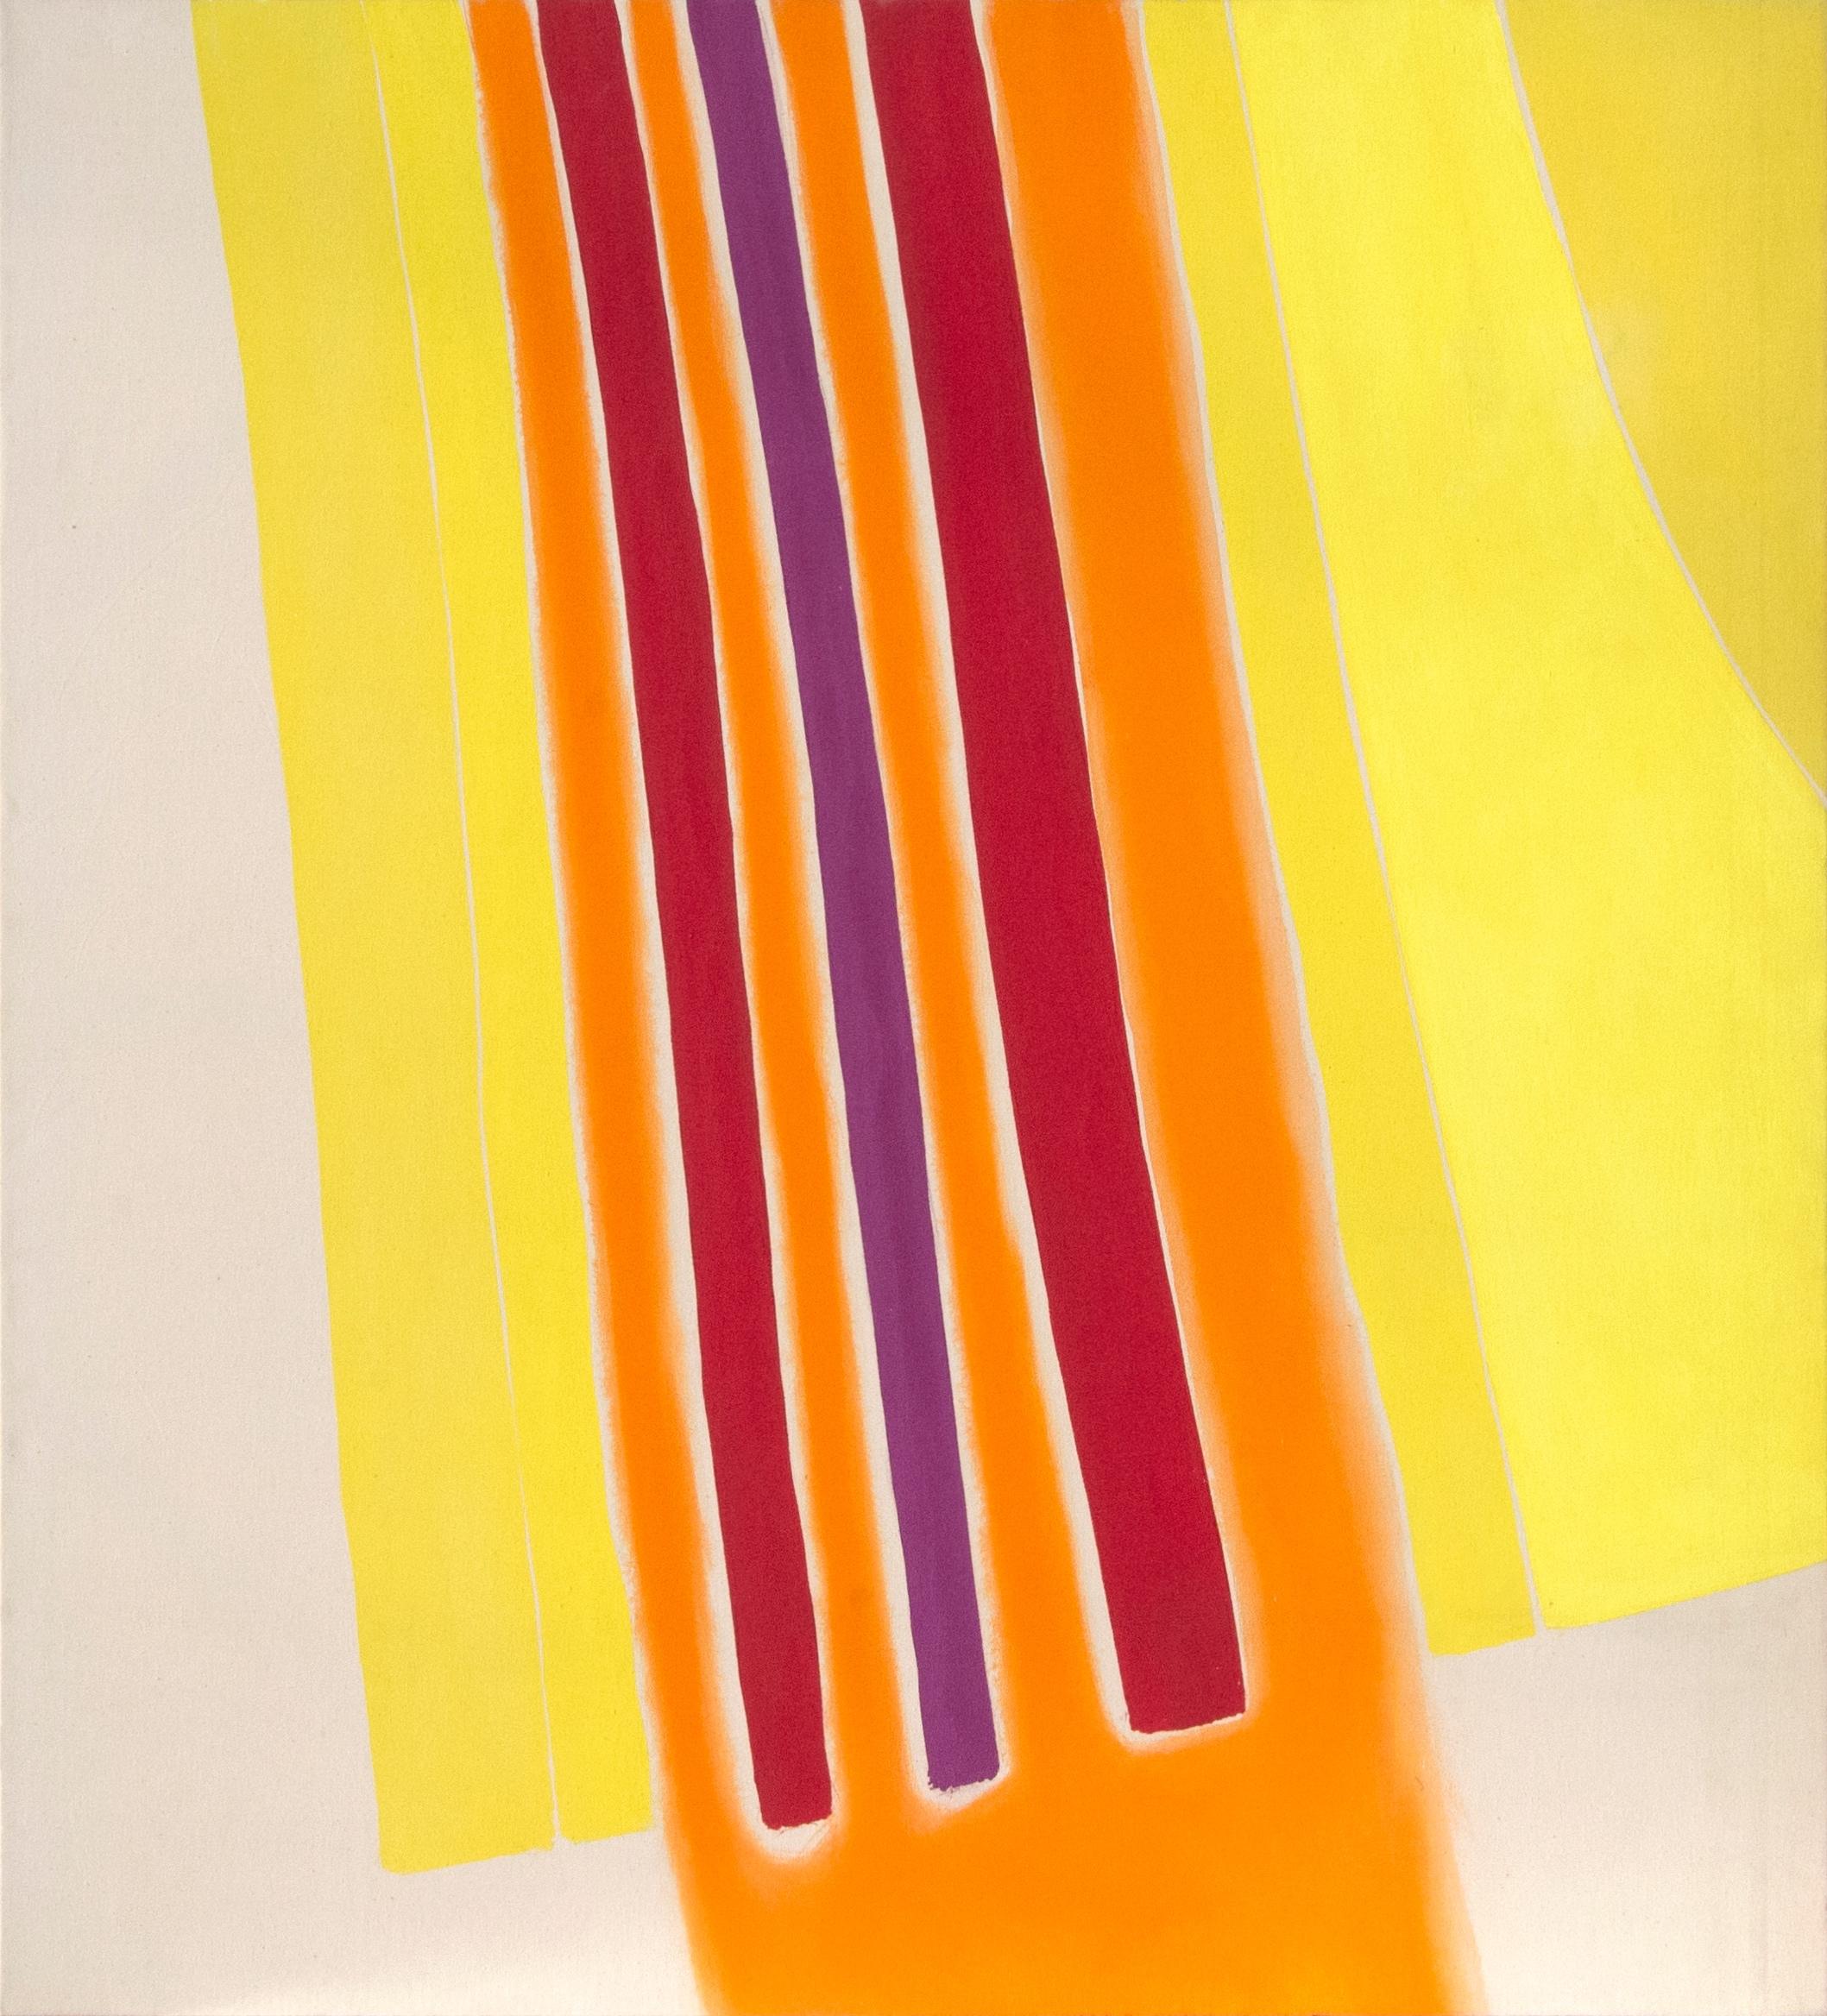 Clinton Hill  13 , 1965 acrylic on canvas 59 1/2 x 54 1/8 in (151.13 x 137.48 cm)